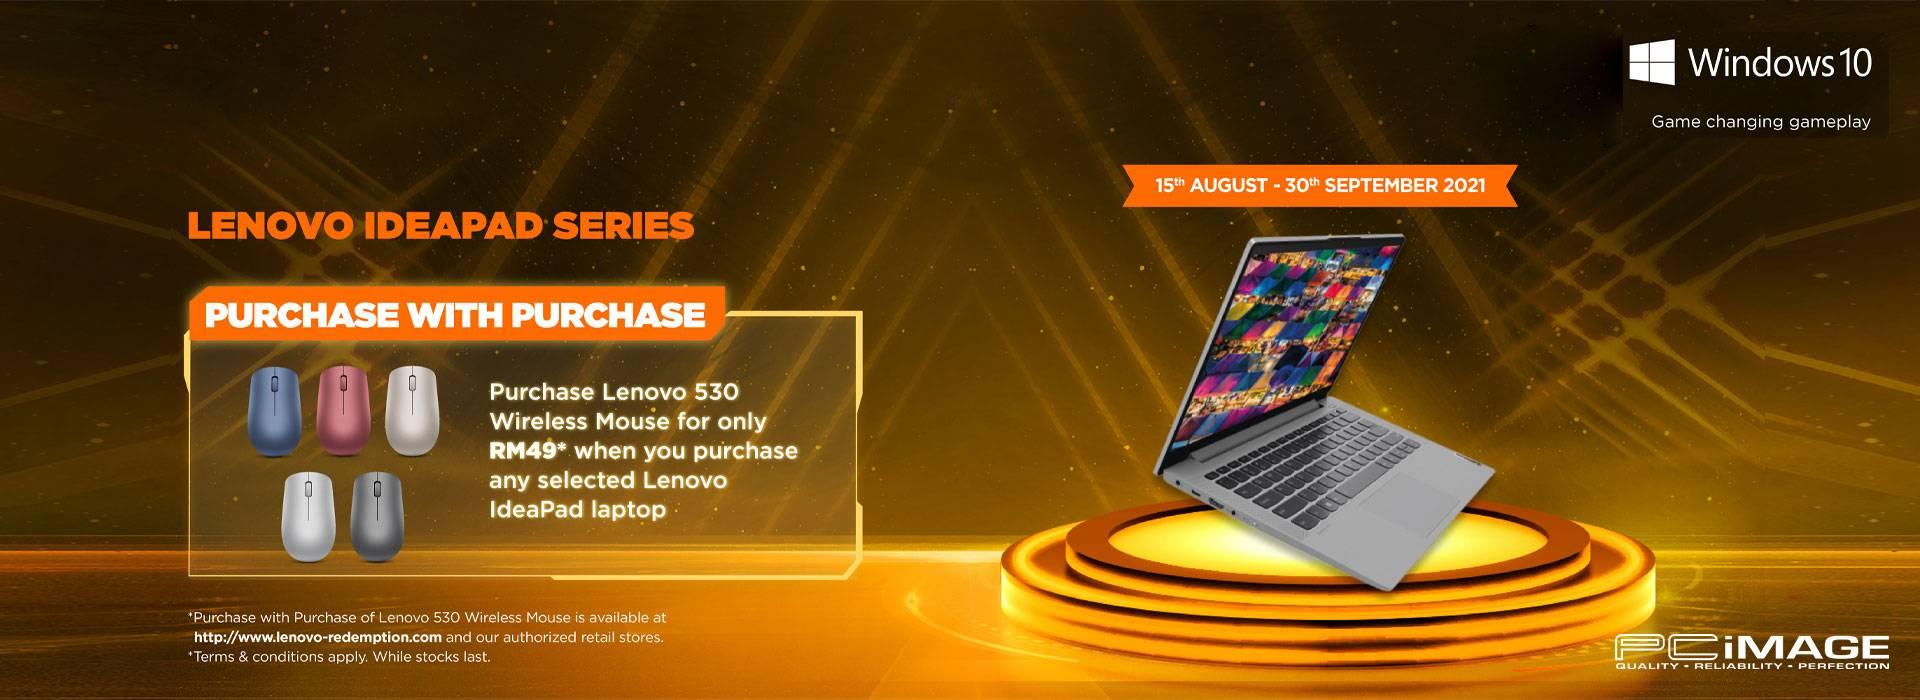 Lenovo IdeaPad Series 30 Sept